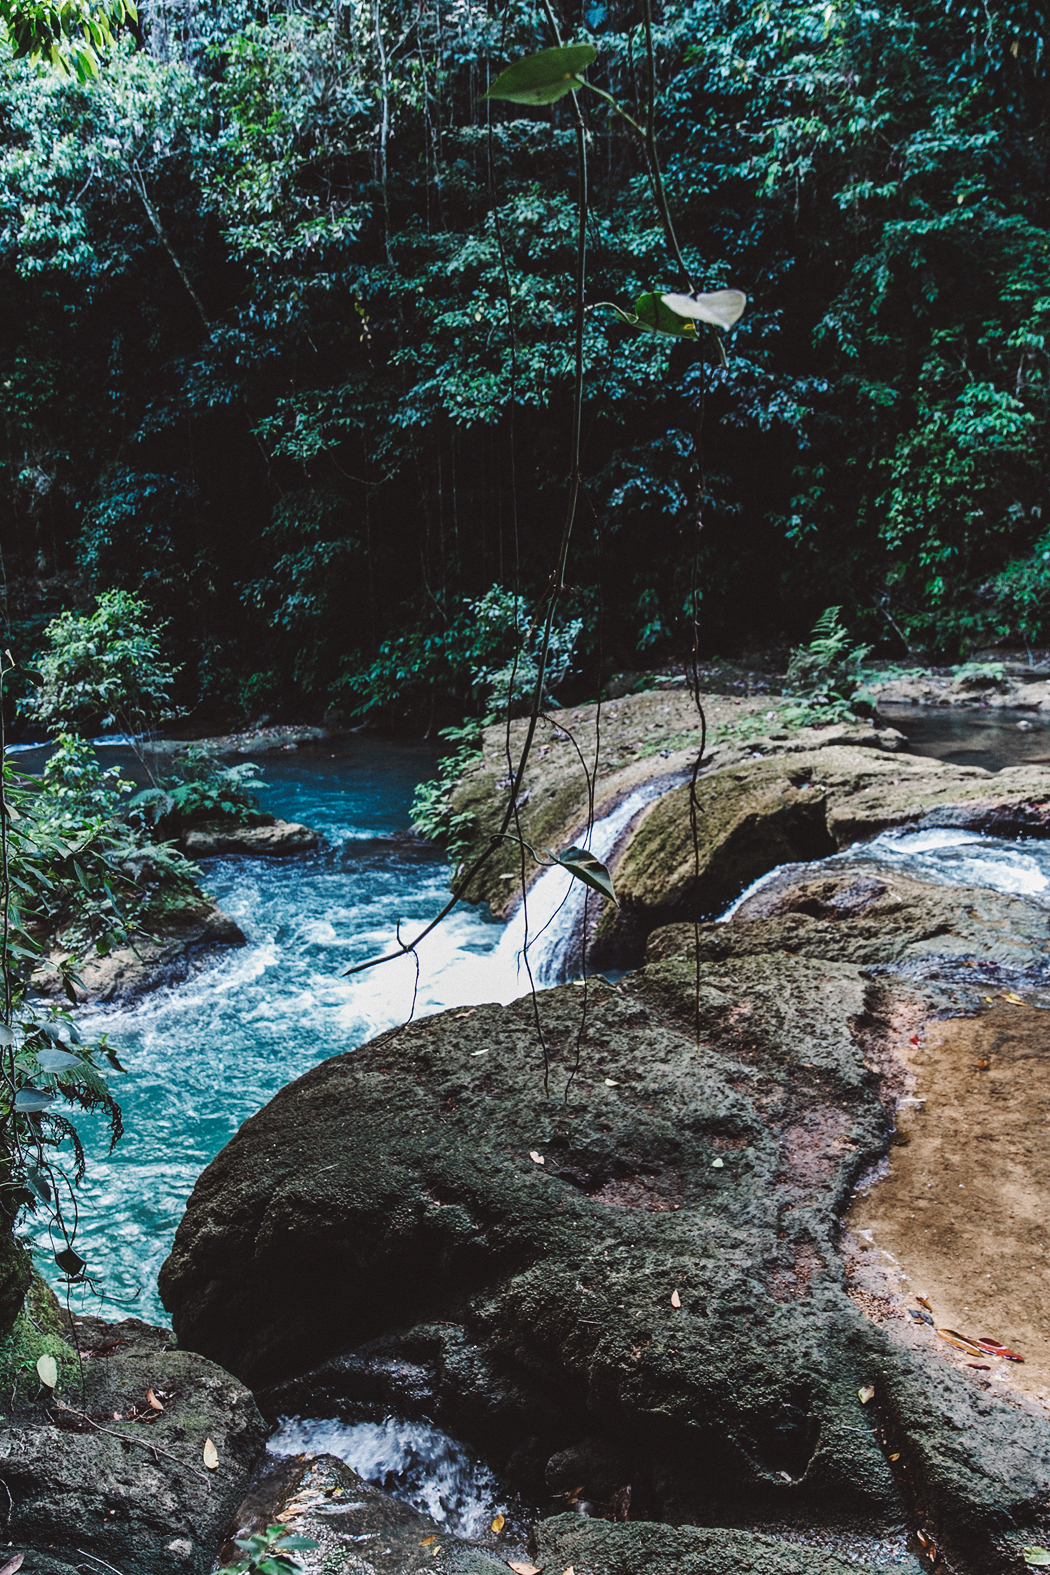 YS_FALLS-Jamaica-Peony_Swimwear-Lack_Of_Colors_Hat-Straw_Hat-Swimwear_Bikini-Outfit-87